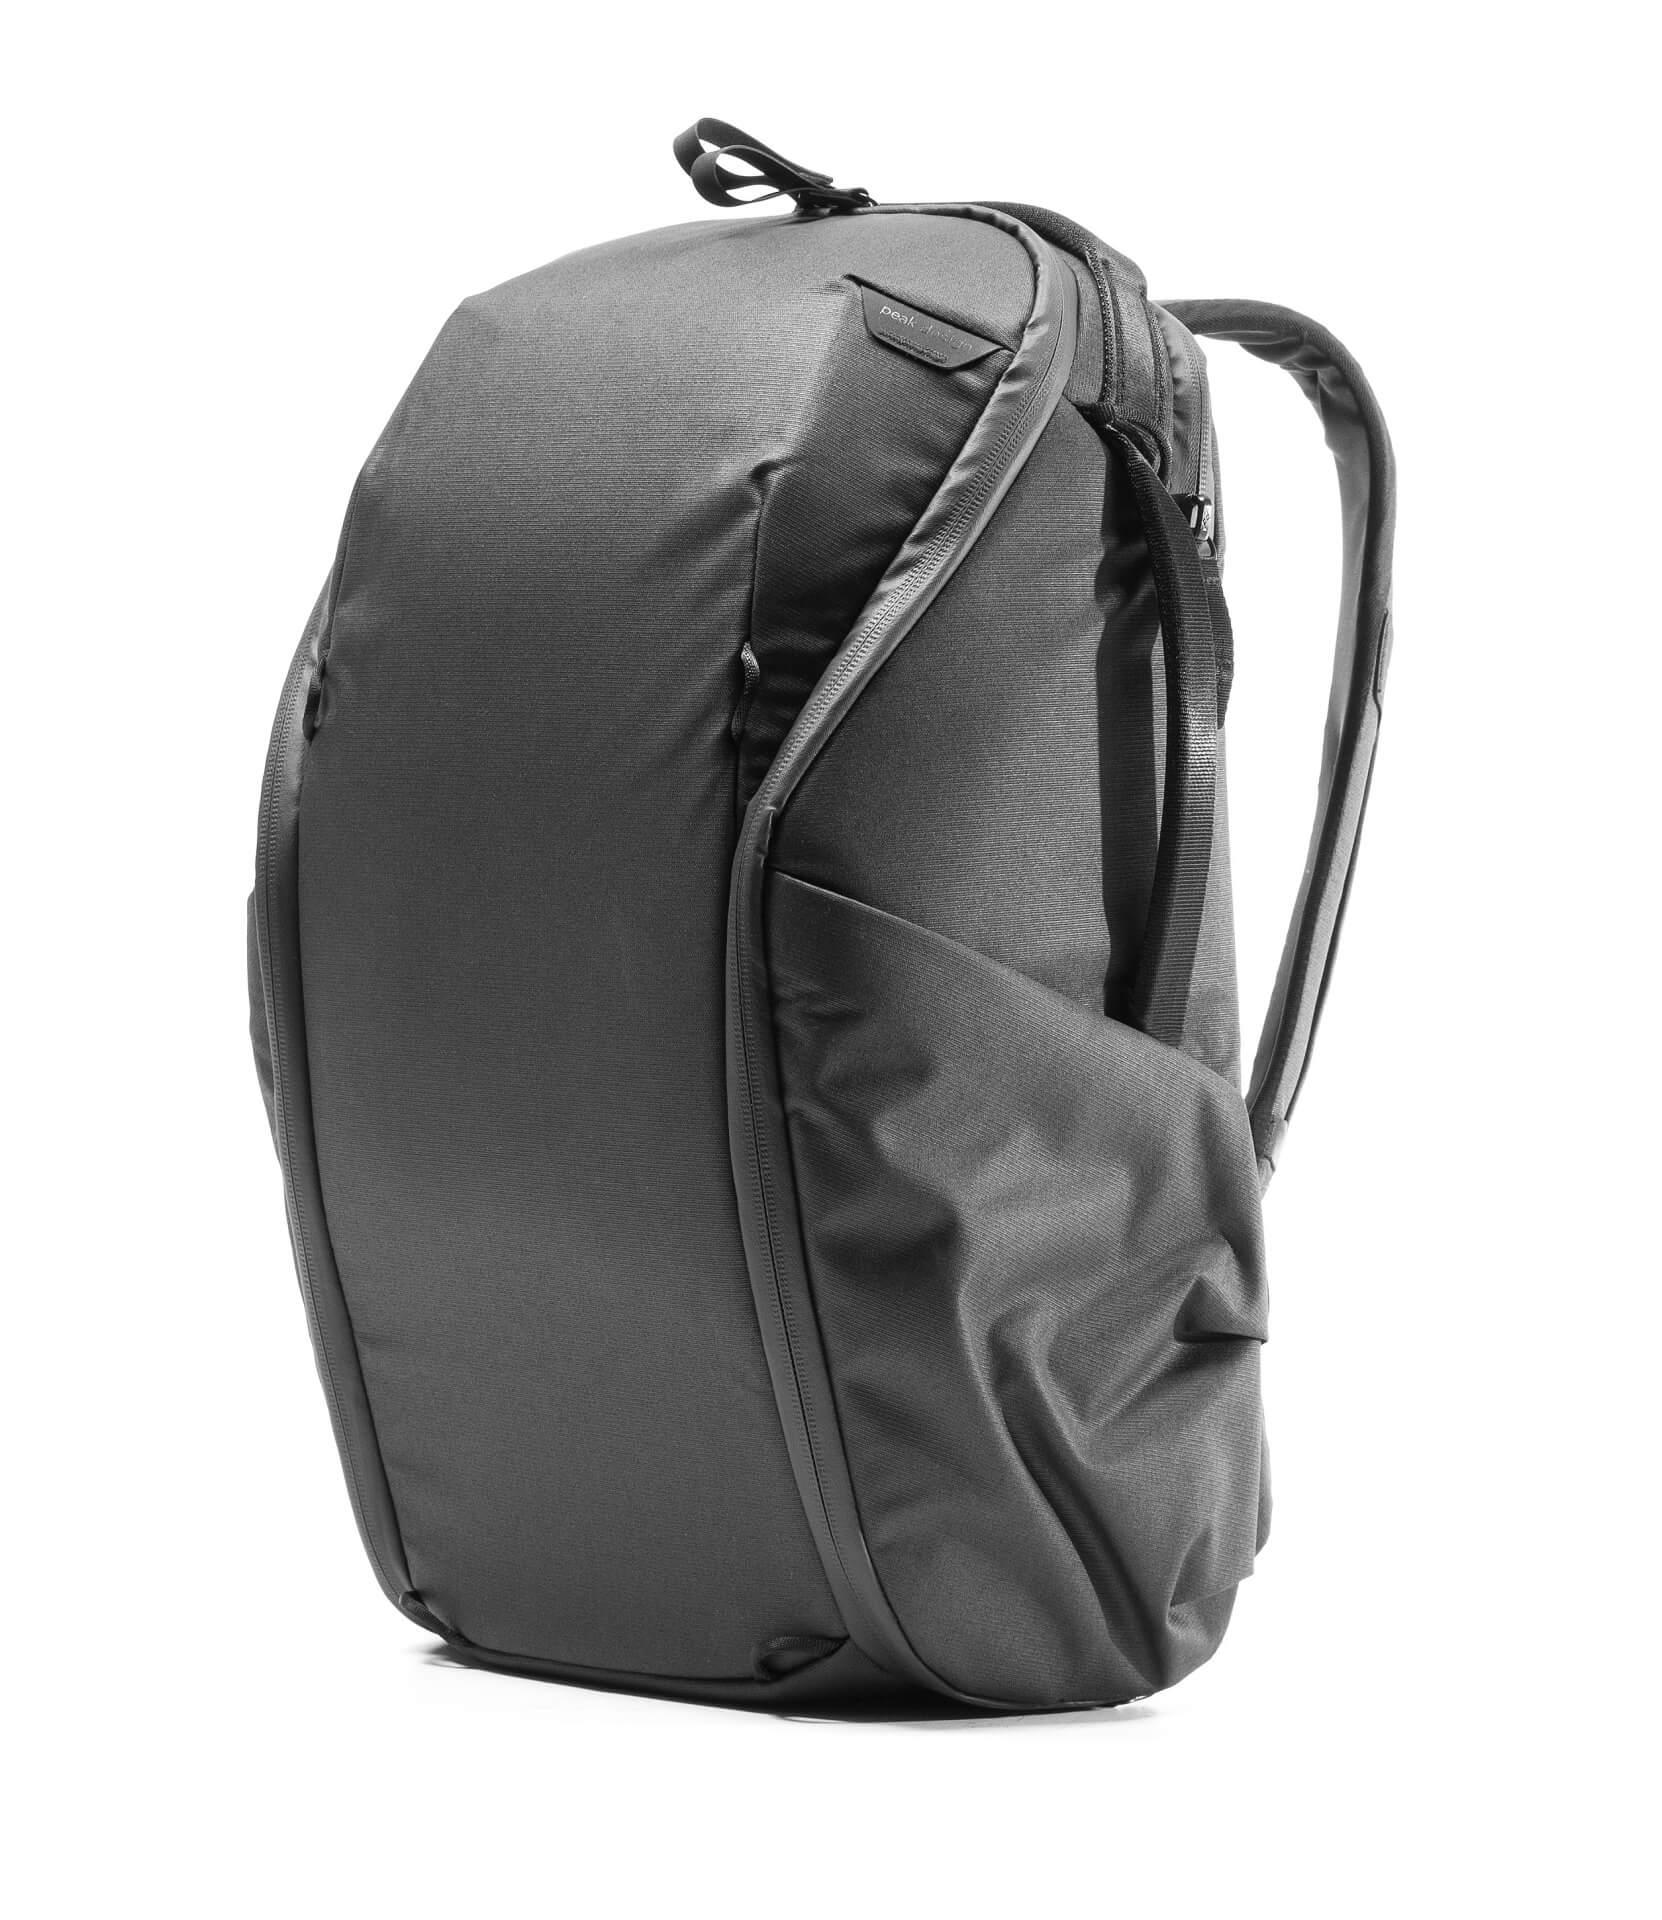 Peak Design Everyday Backpack Zip | Zdroj foto Peak Design